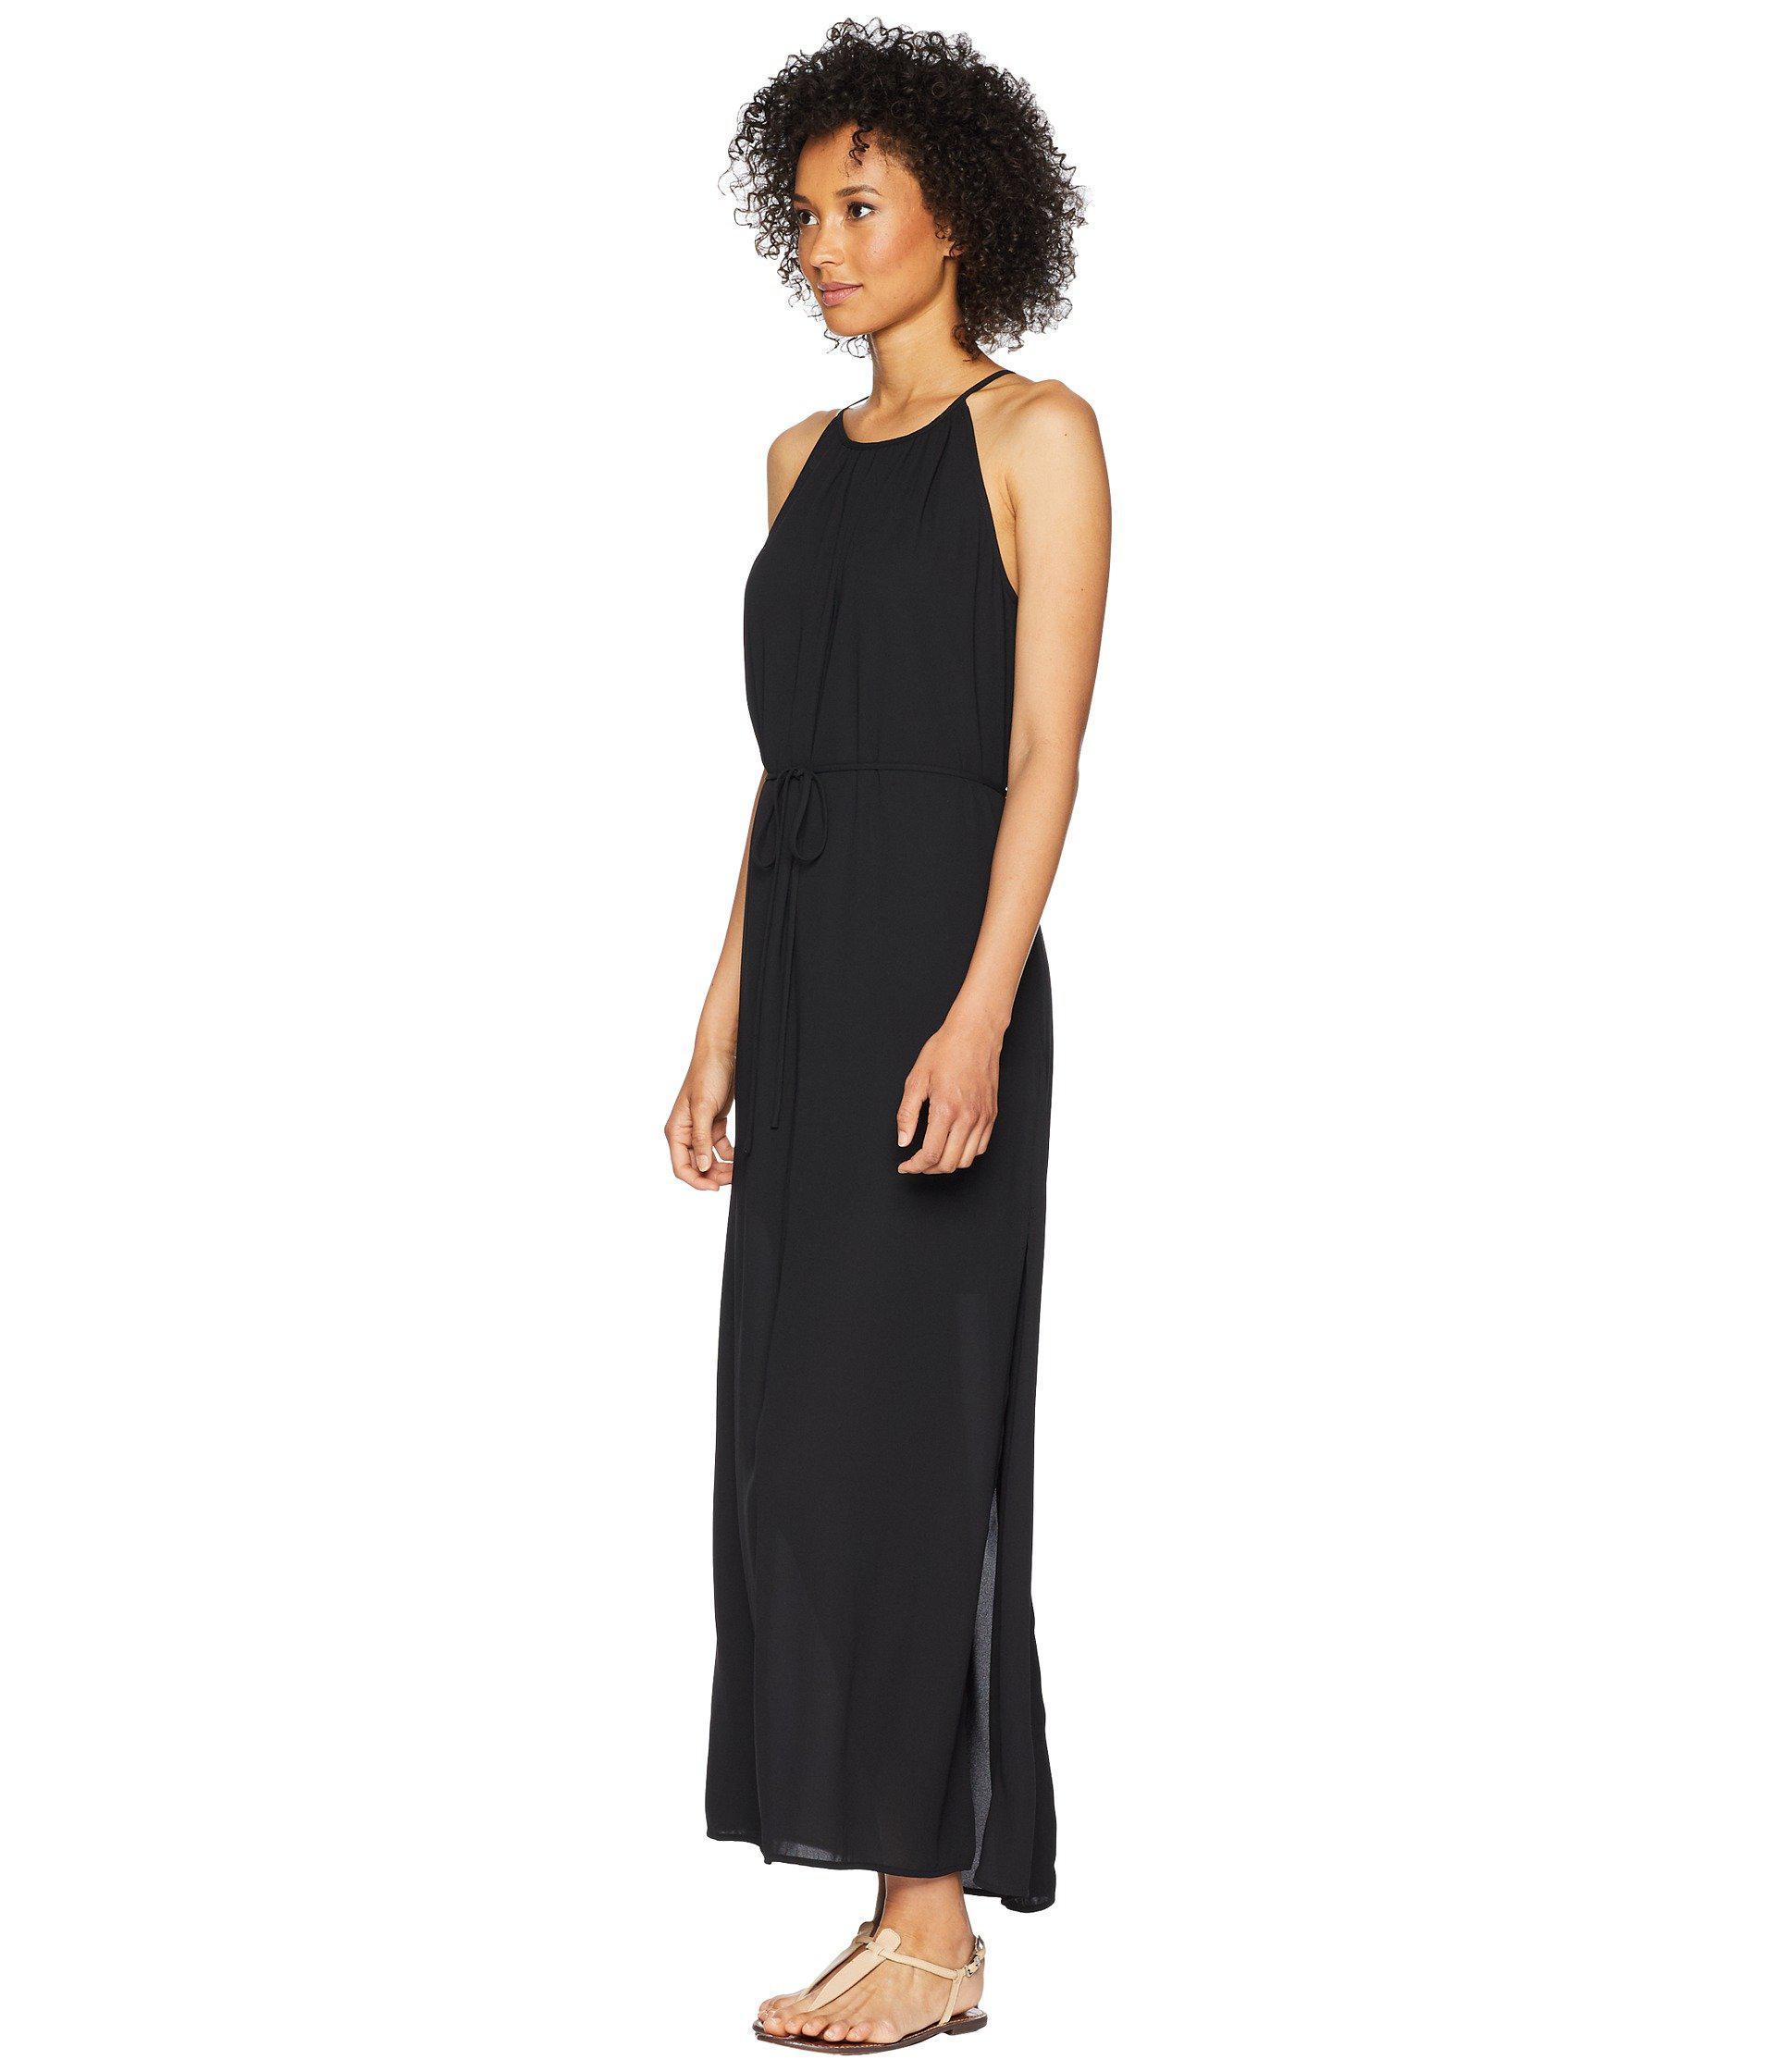 118fe1ac87d Lyst - Karen Kane Morgan Halter Maxi Dress in Black - Save 26%